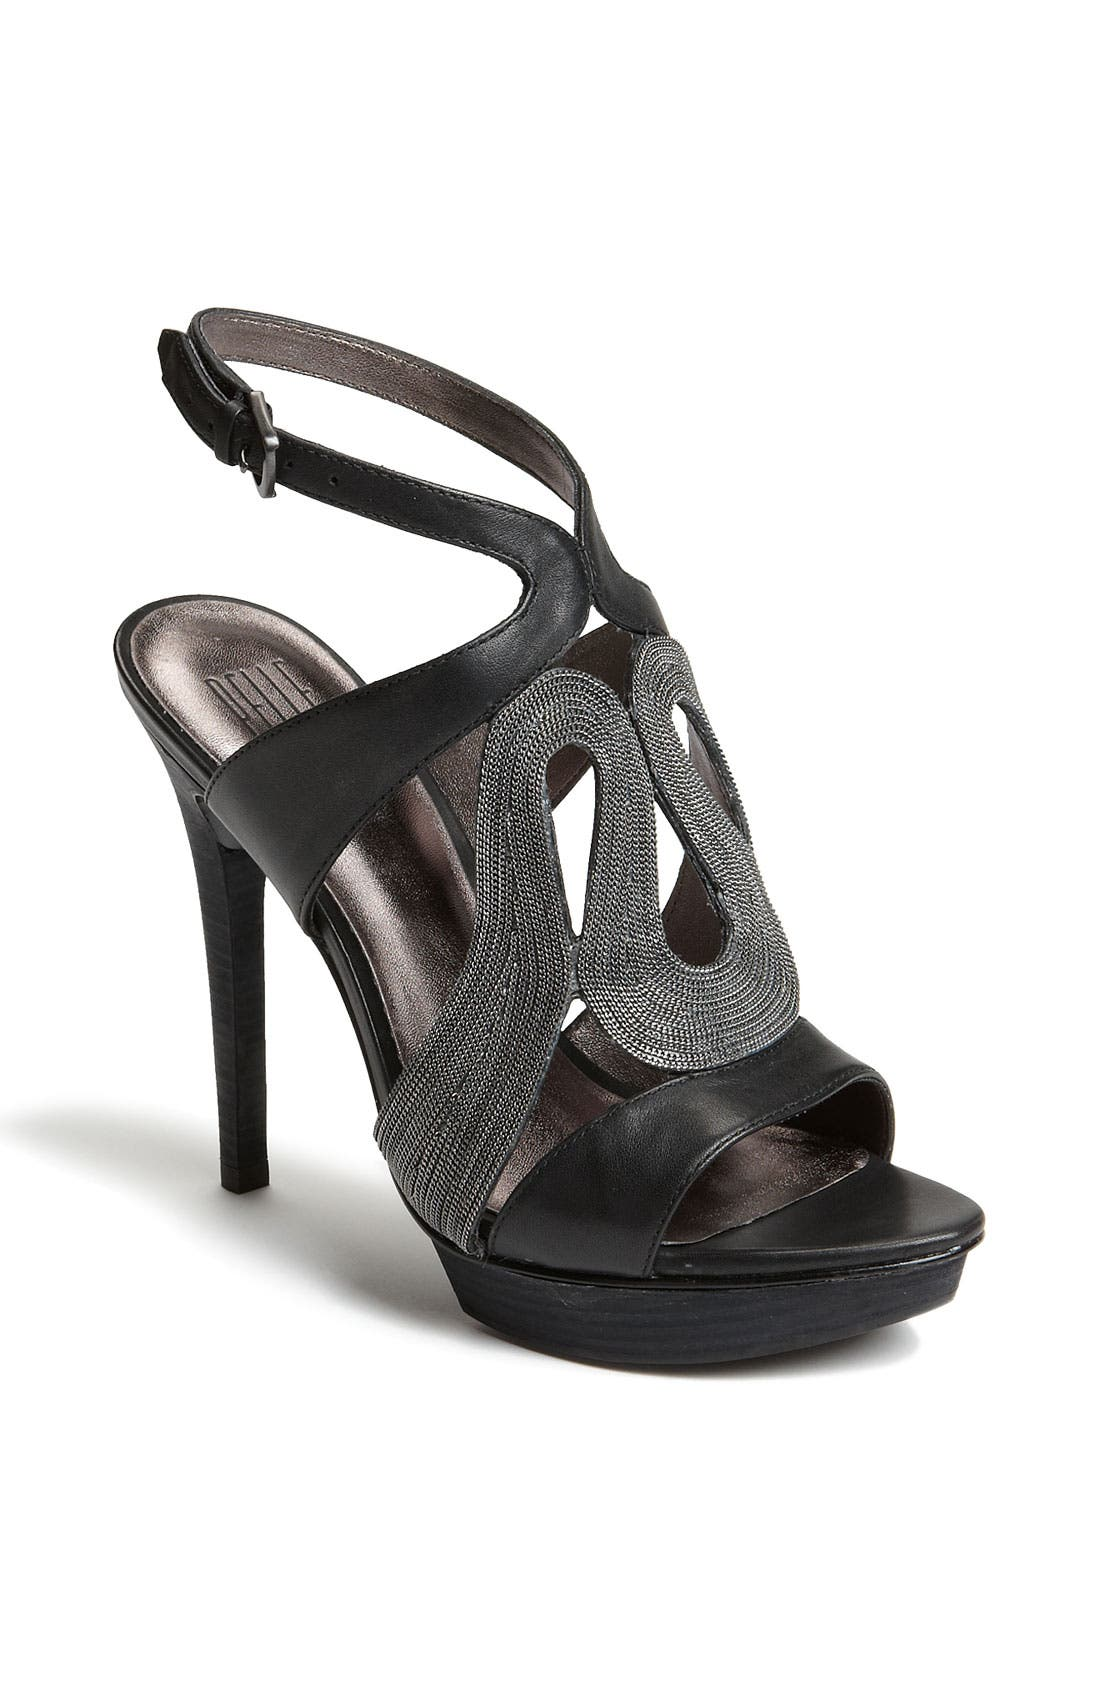 Alternate Image 1 Selected - Pelle Moda 'Shila' Platform Sandal